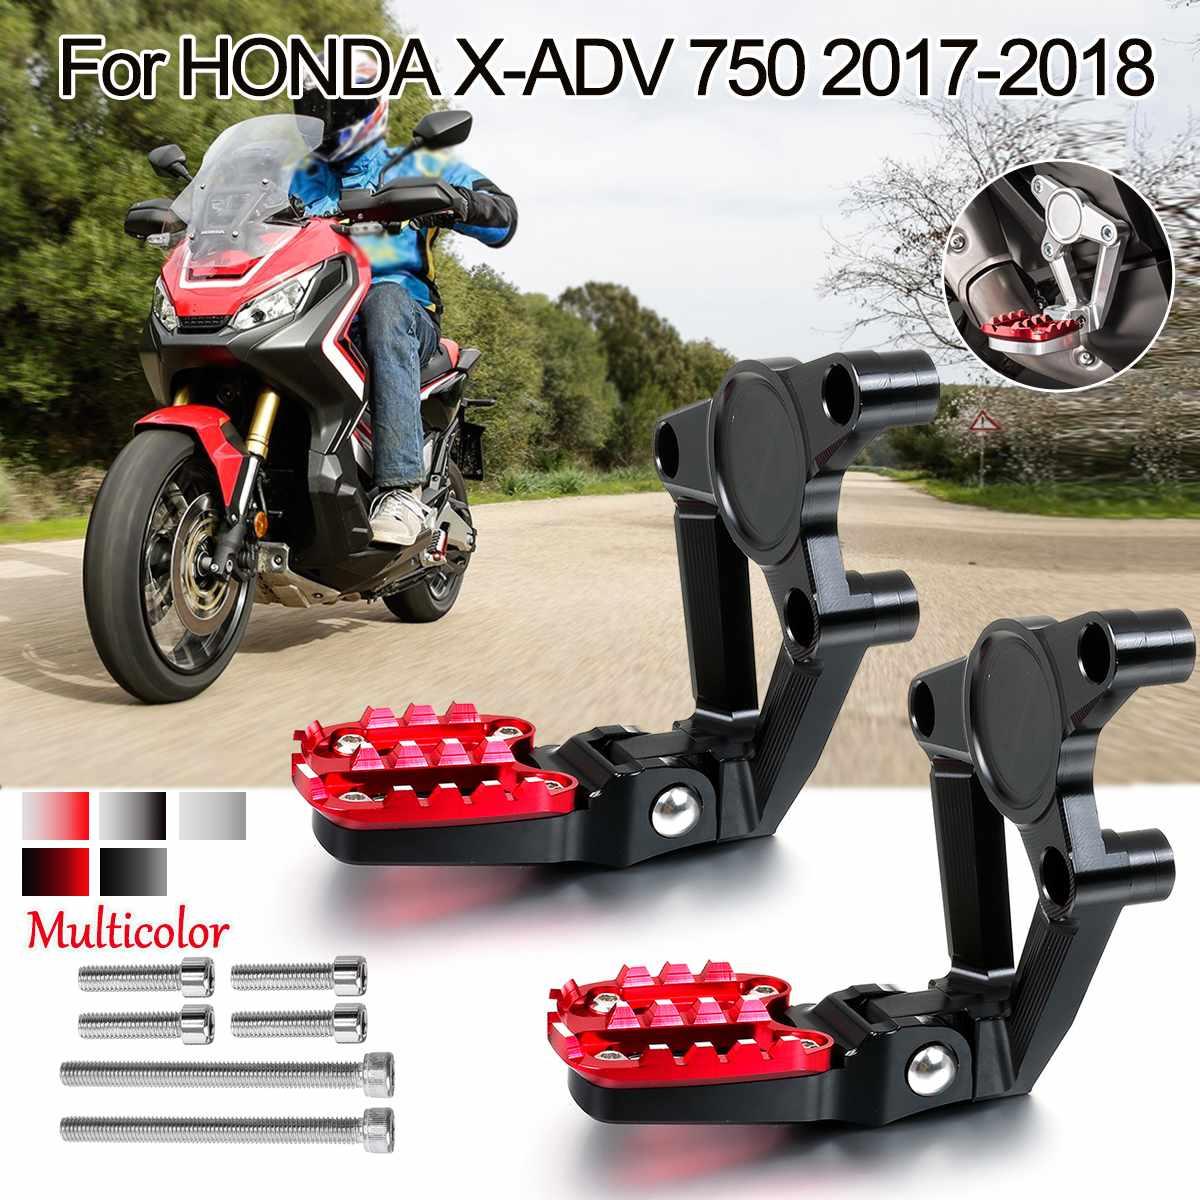 Motorcycle CNC Aluminum Rear Foot Set Footrest Foot Pegs Pedal Passenger Rearsets For HONDA X-ADV XADV X ADV 750 2017 2018